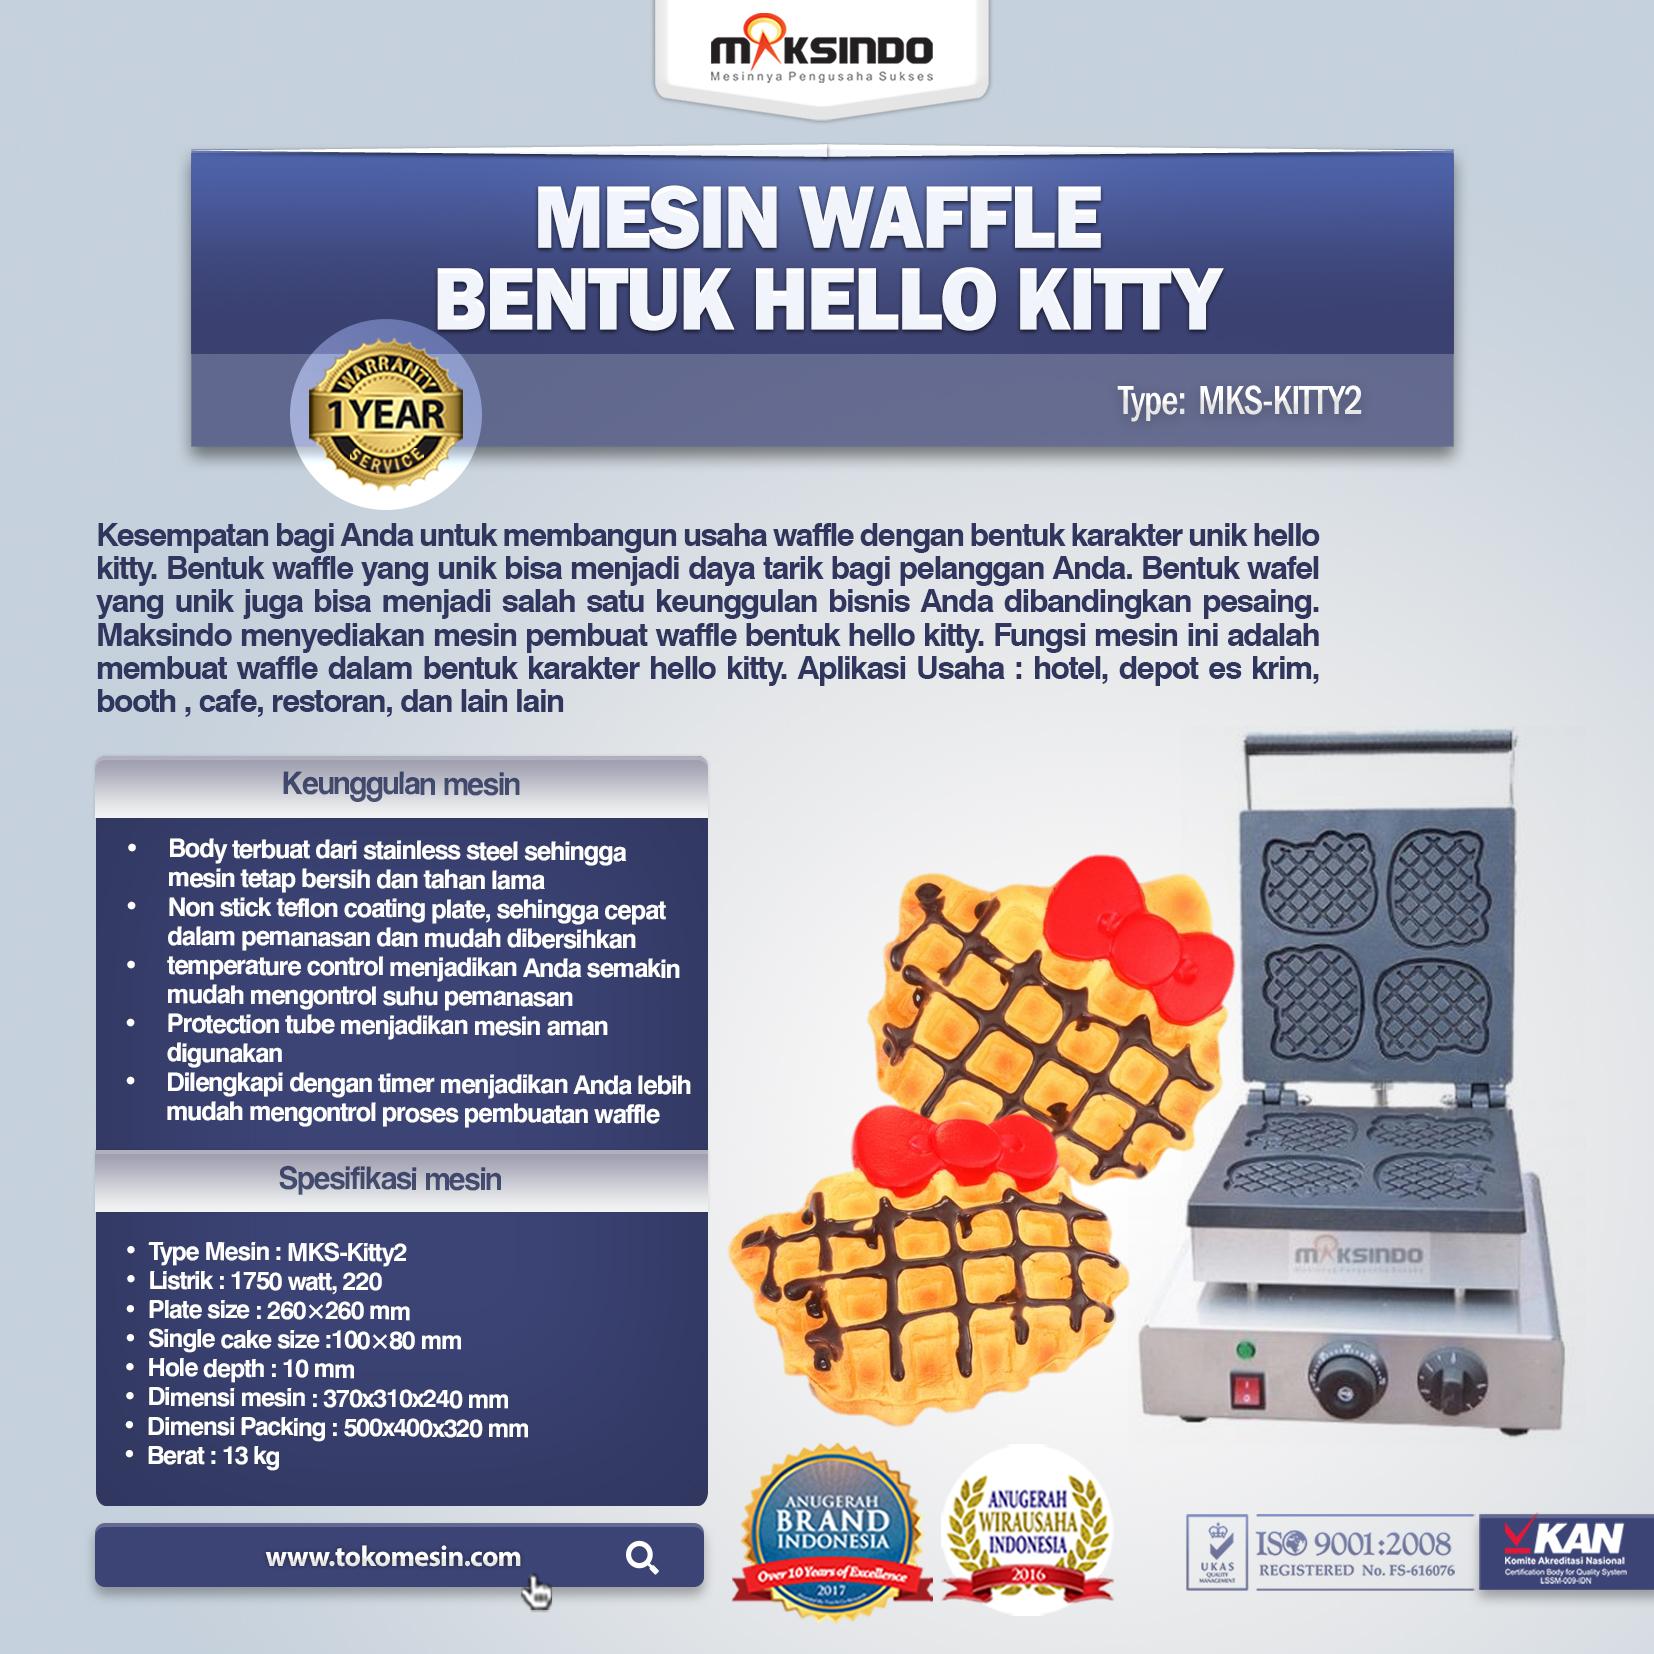 Jual Mesin Waffle Bentuk Hello Kitty Kitty2 Di Tangerang